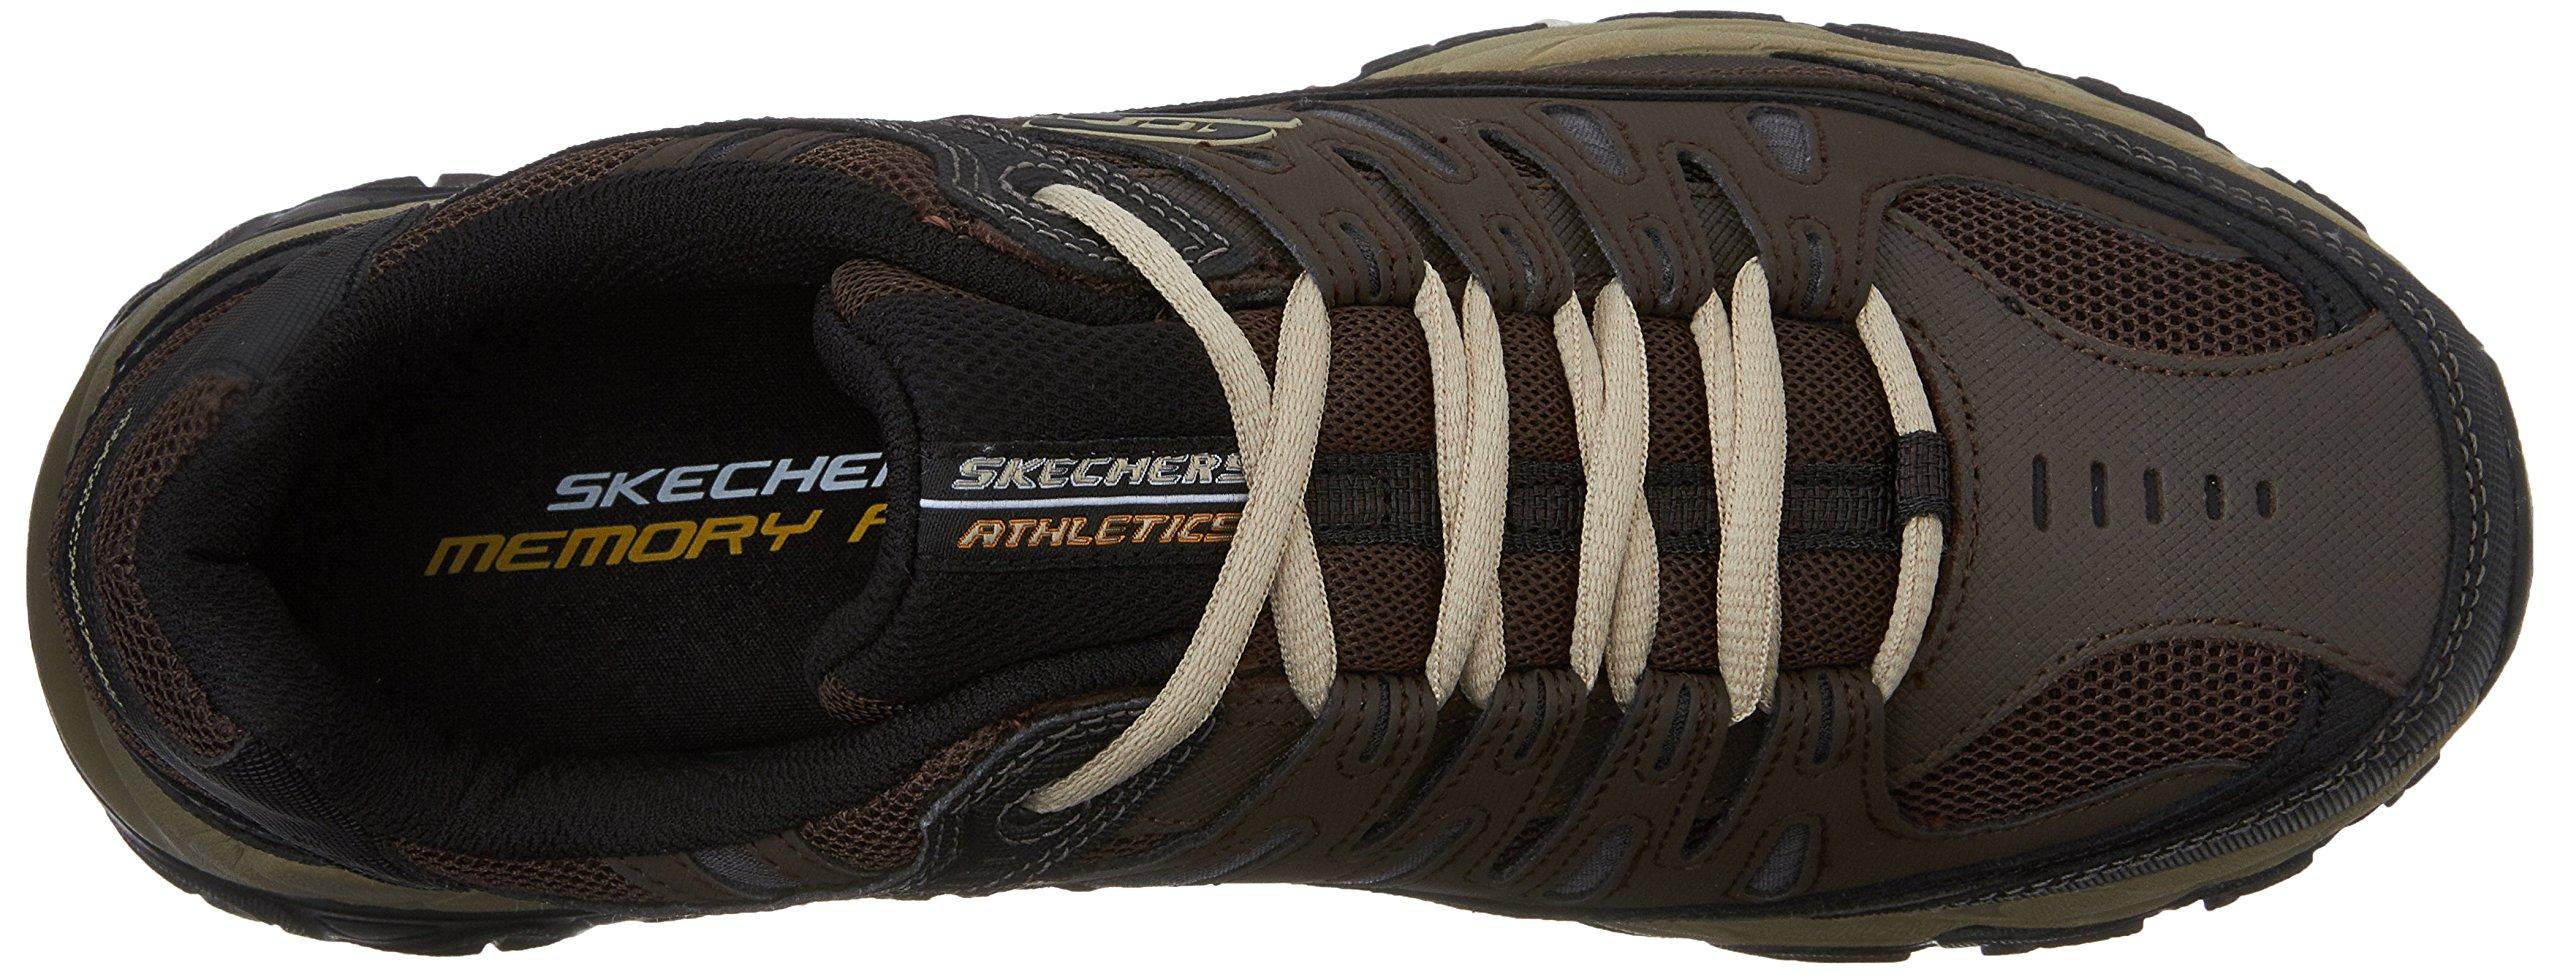 Skechers Men's AFTERBURNM.FIT Memory Foam Lace-Up Sneaker, Brown/Taupe, 7.5 M US by Skechers (Image #8)